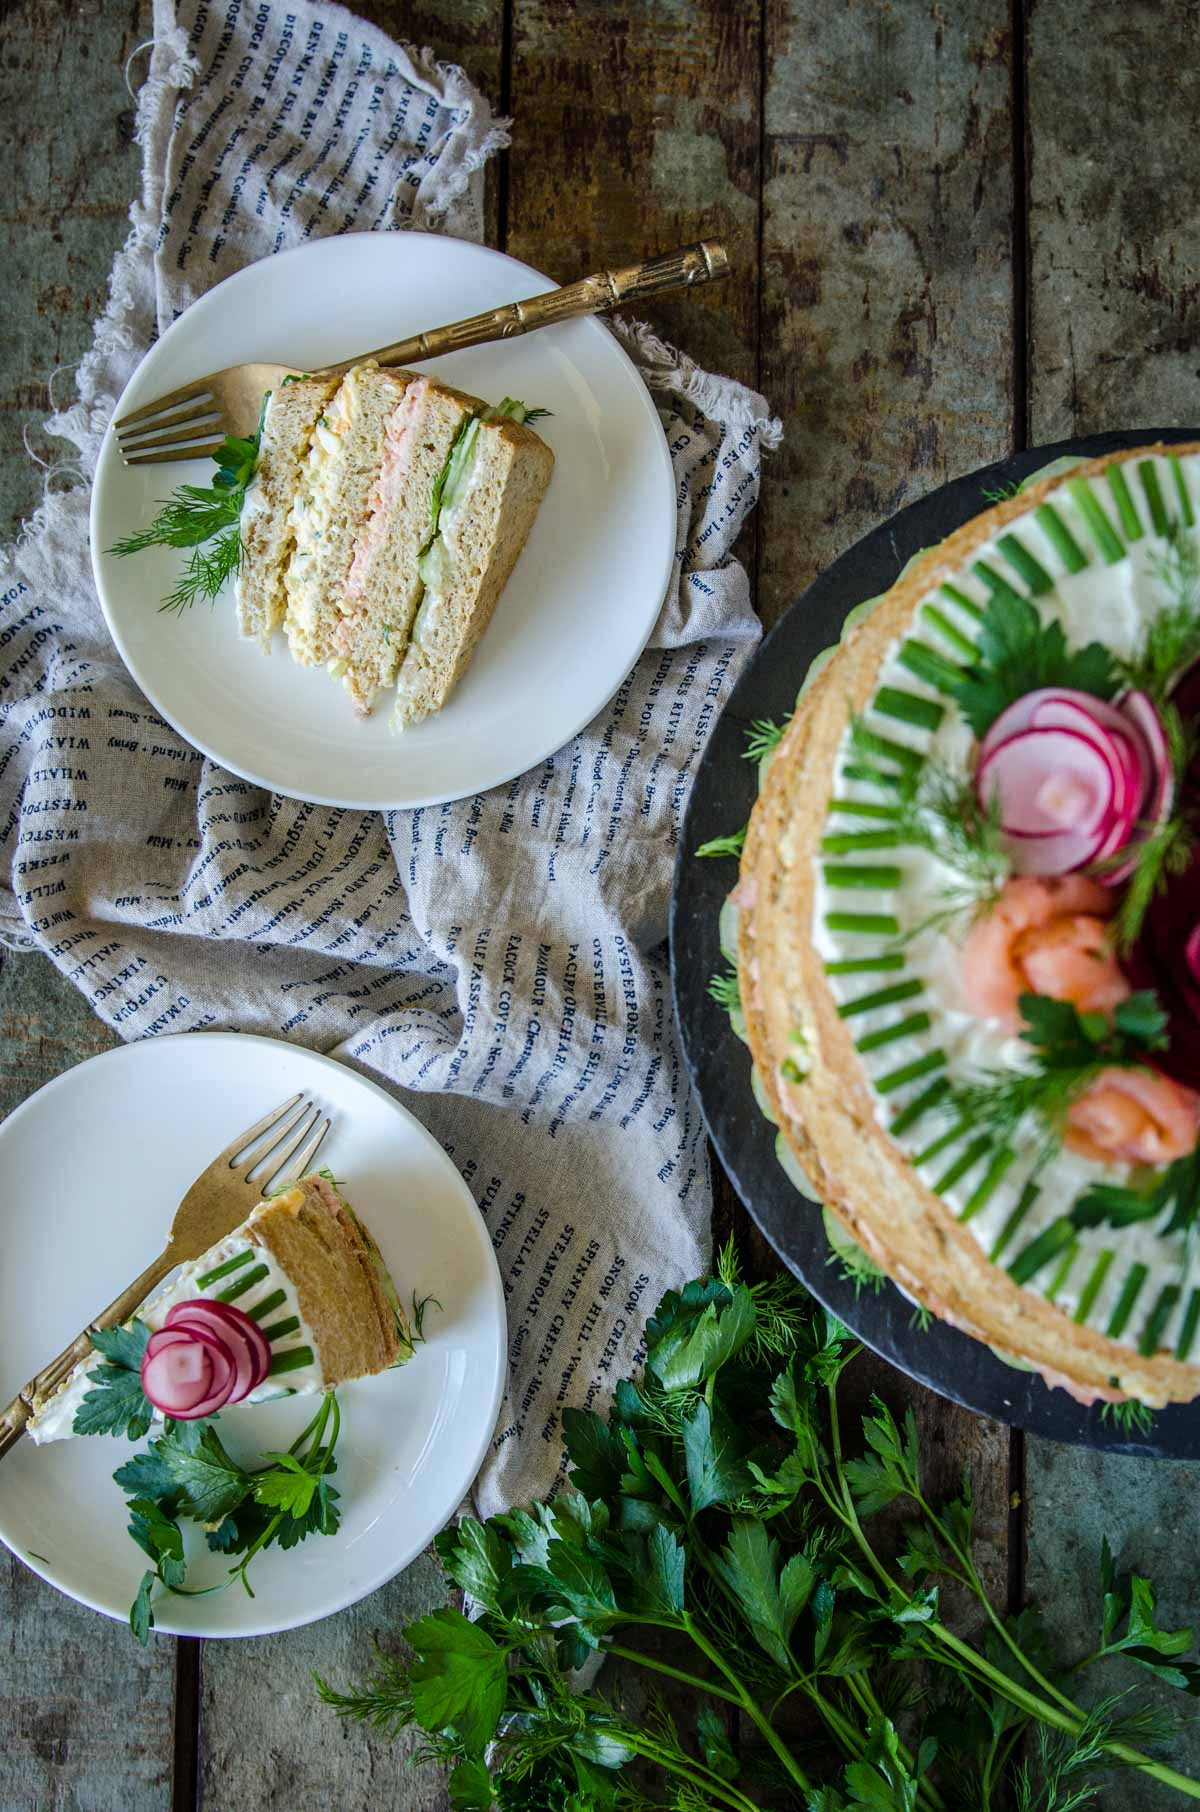 Smörgåstårta | Swedish Sandwich Cake | Chew Town Food Blog